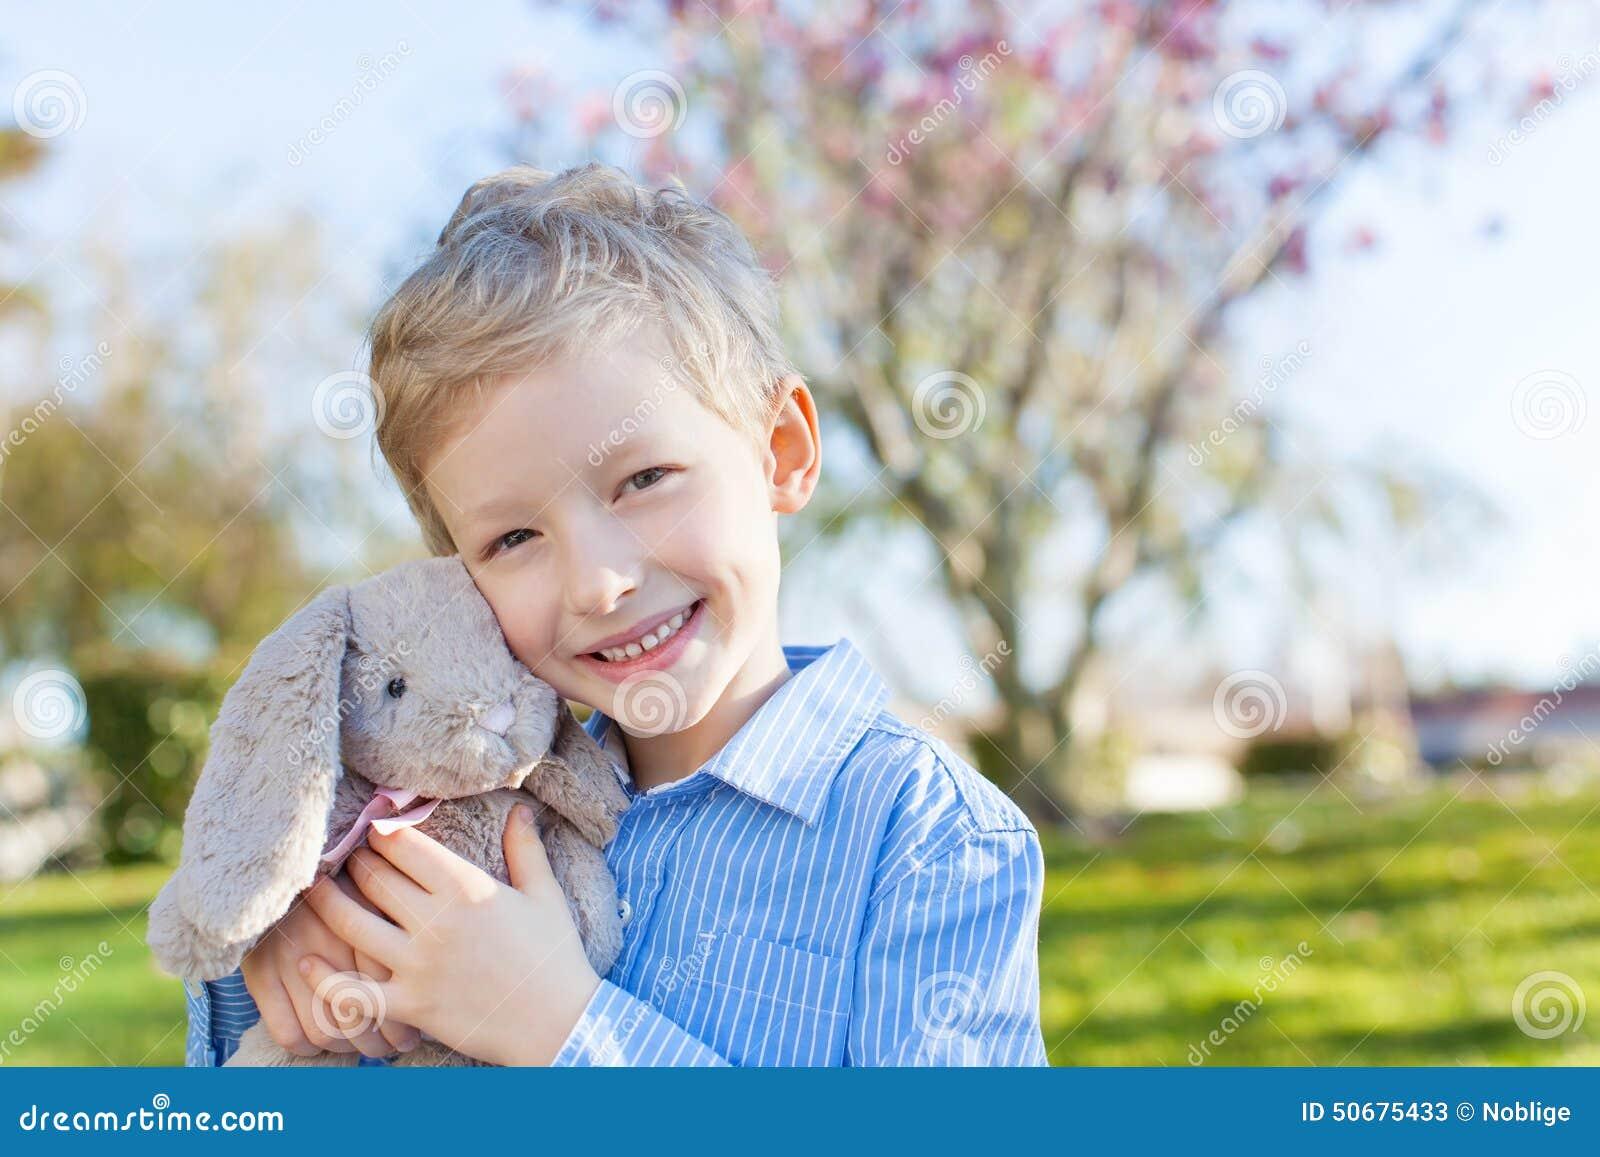 Download 复活节时间的男孩 库存图片. 图片 包括有 藏品, 男朋友, 鸡蛋, 节假日, 水平, 逗人喜爱, 快乐 - 50675433